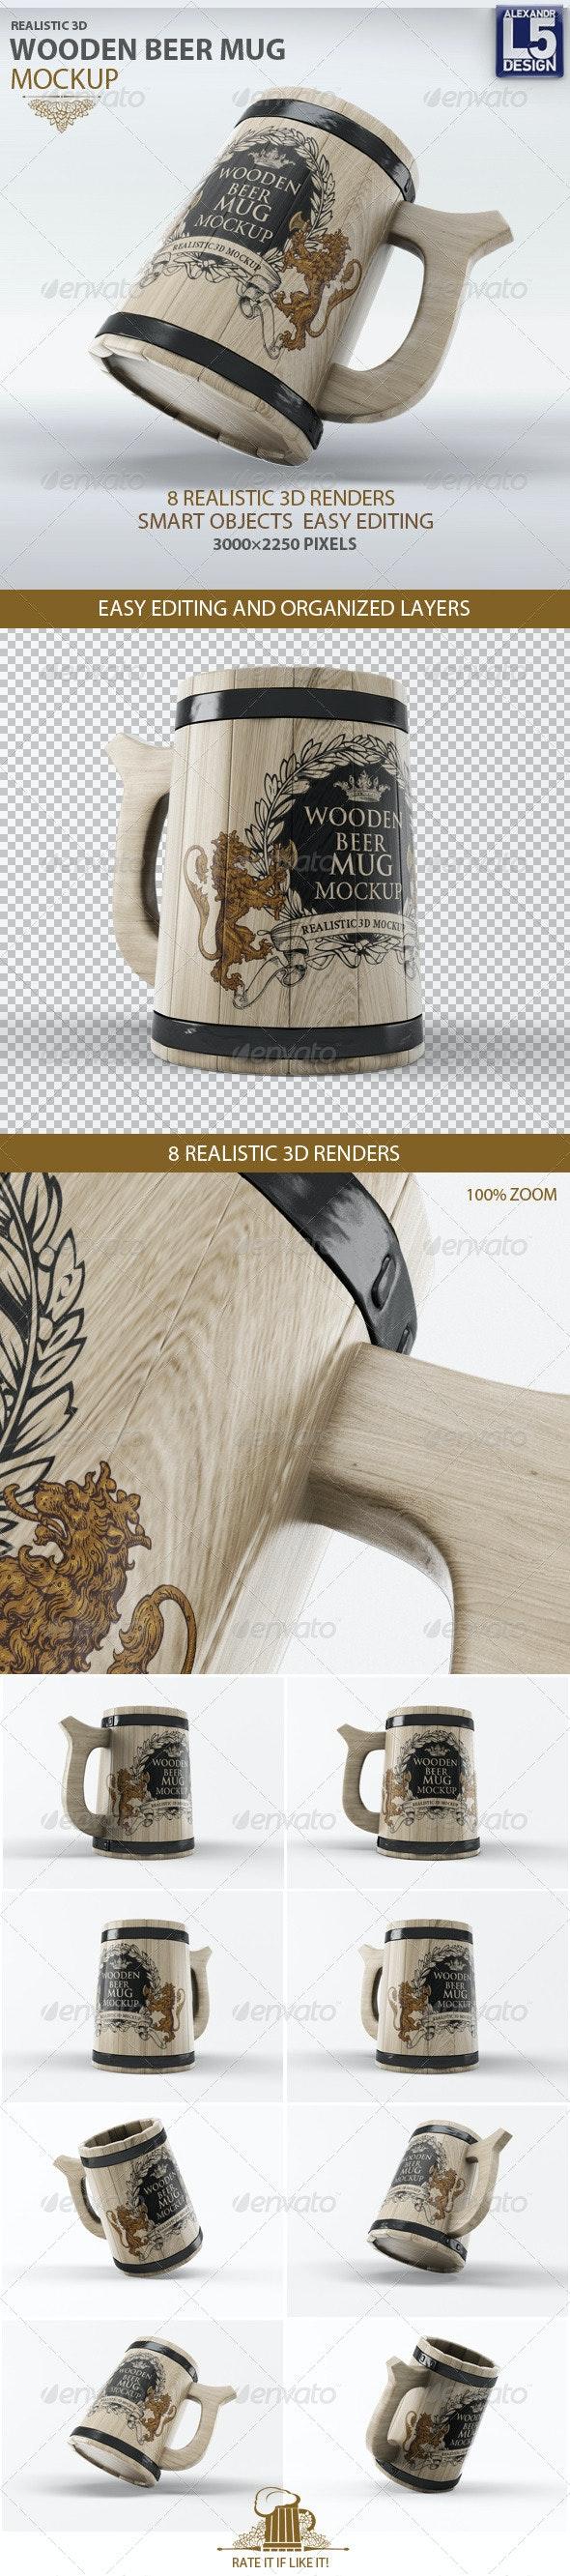 Wooden Beer Mug Mock-Up - Product Mock-Ups Graphics